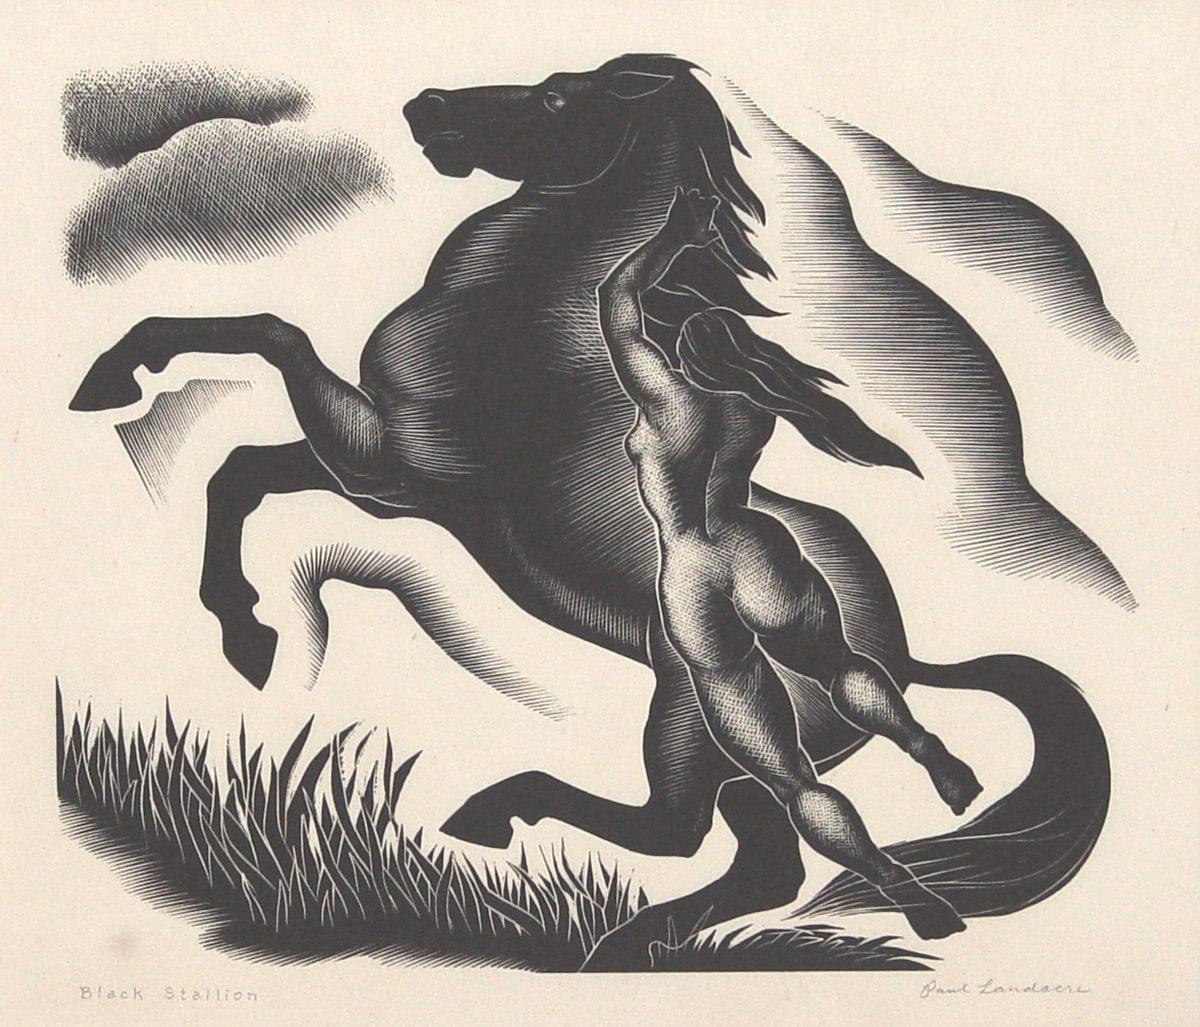 LANDACRE_Black Stallion